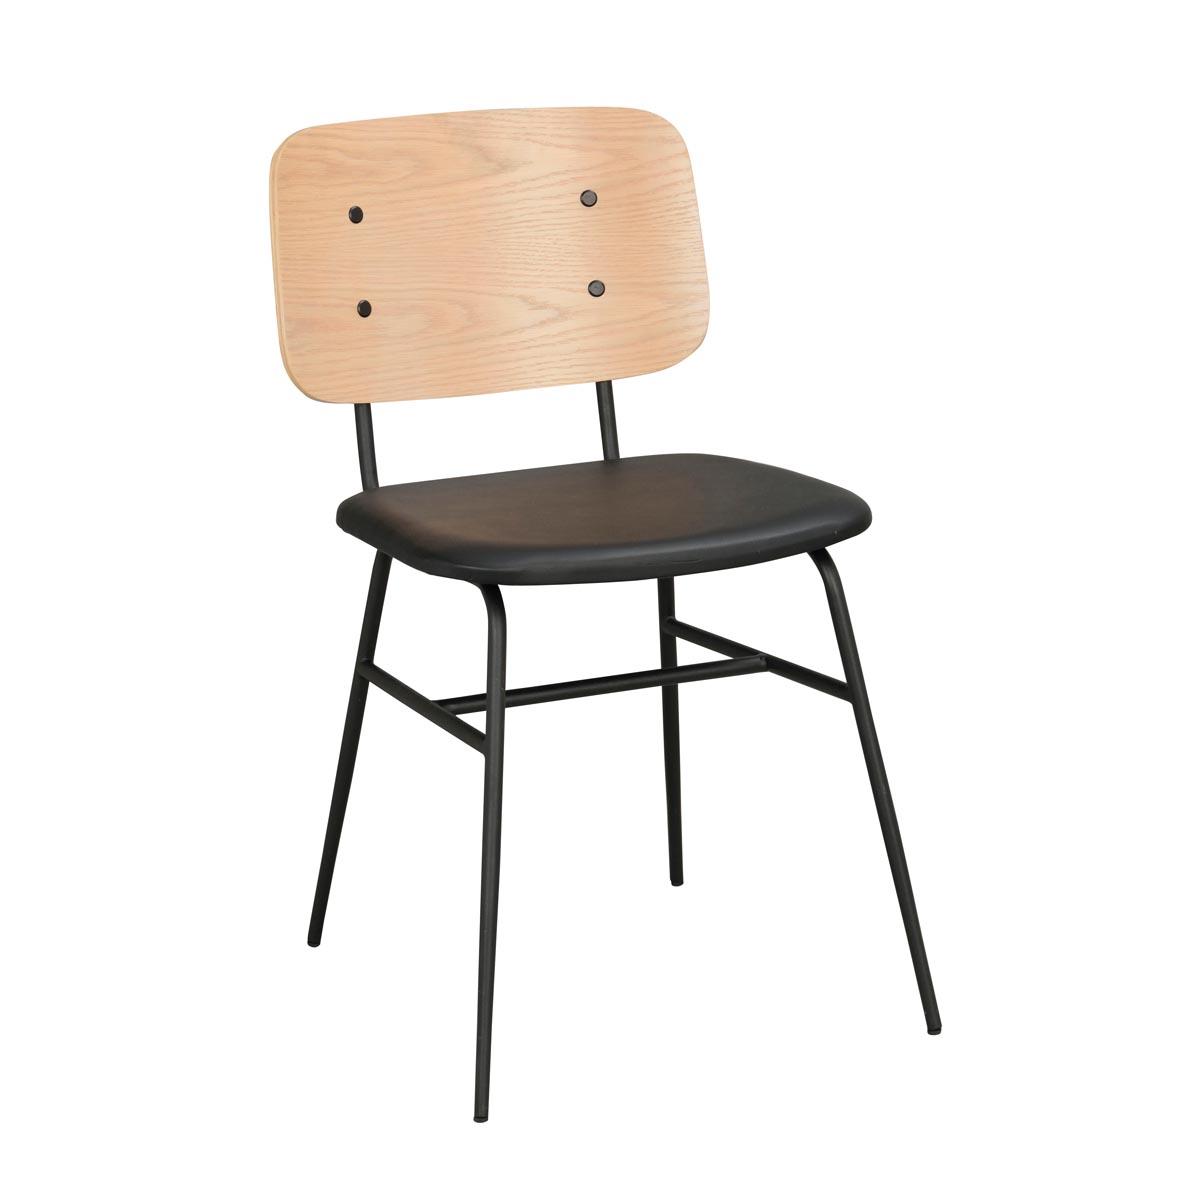 Brent-stol-vitpigm_svartR-118980_b